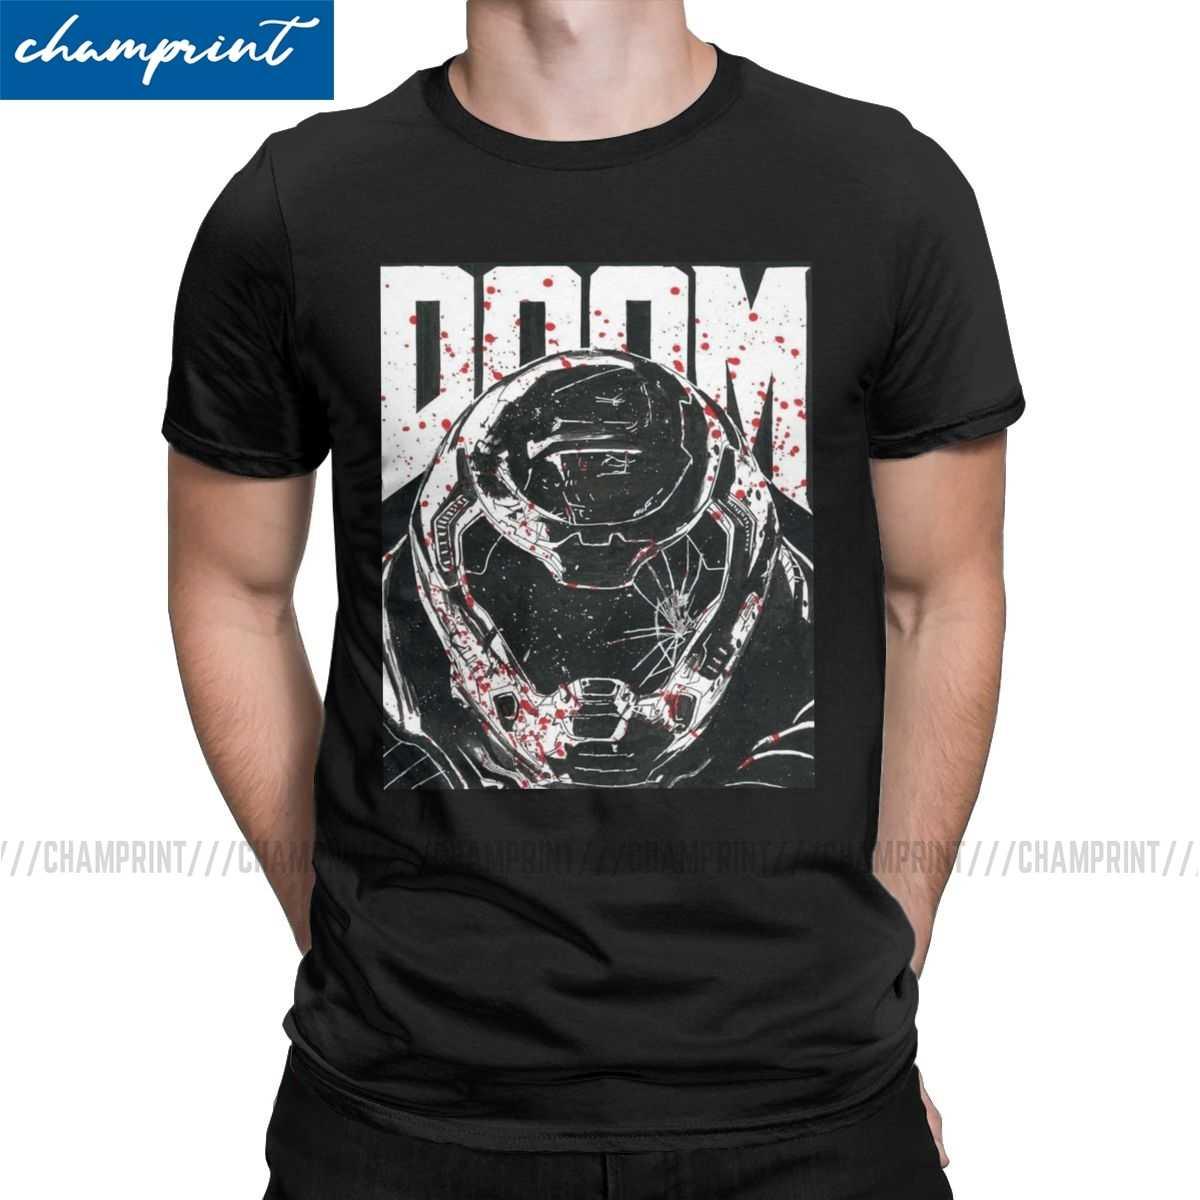 Doom Eeuwige Doomslayer Mannen T Shirts Doomguy Doom Slayer Cacodemon Nieuwigheid Tee Shirt Korte Mouw Ronde Kraag T-shirts